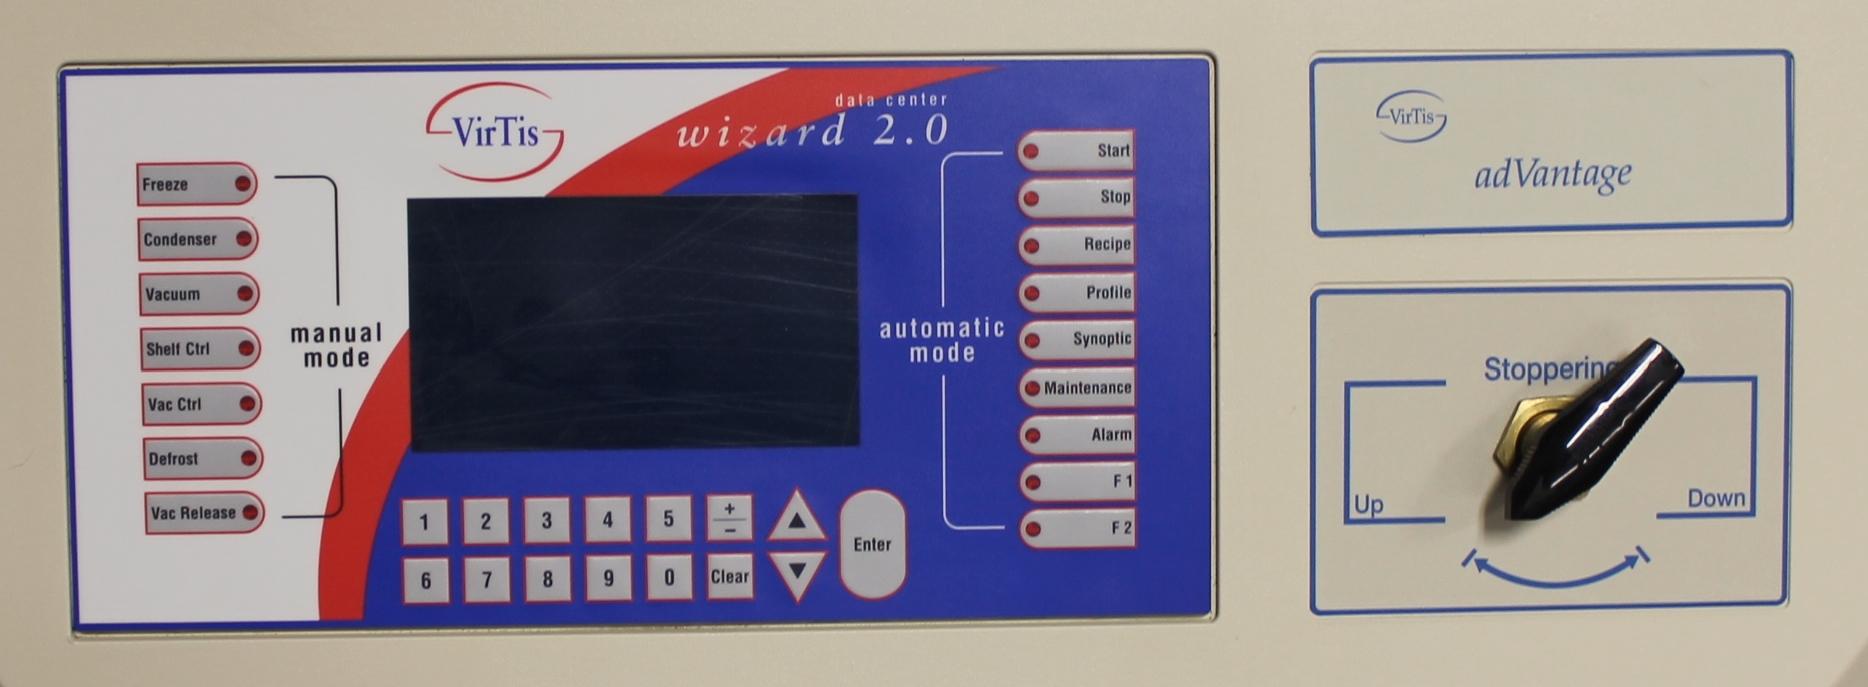 Refurbished VirTis AdVantage Plus BenchTop Freeze Dryer